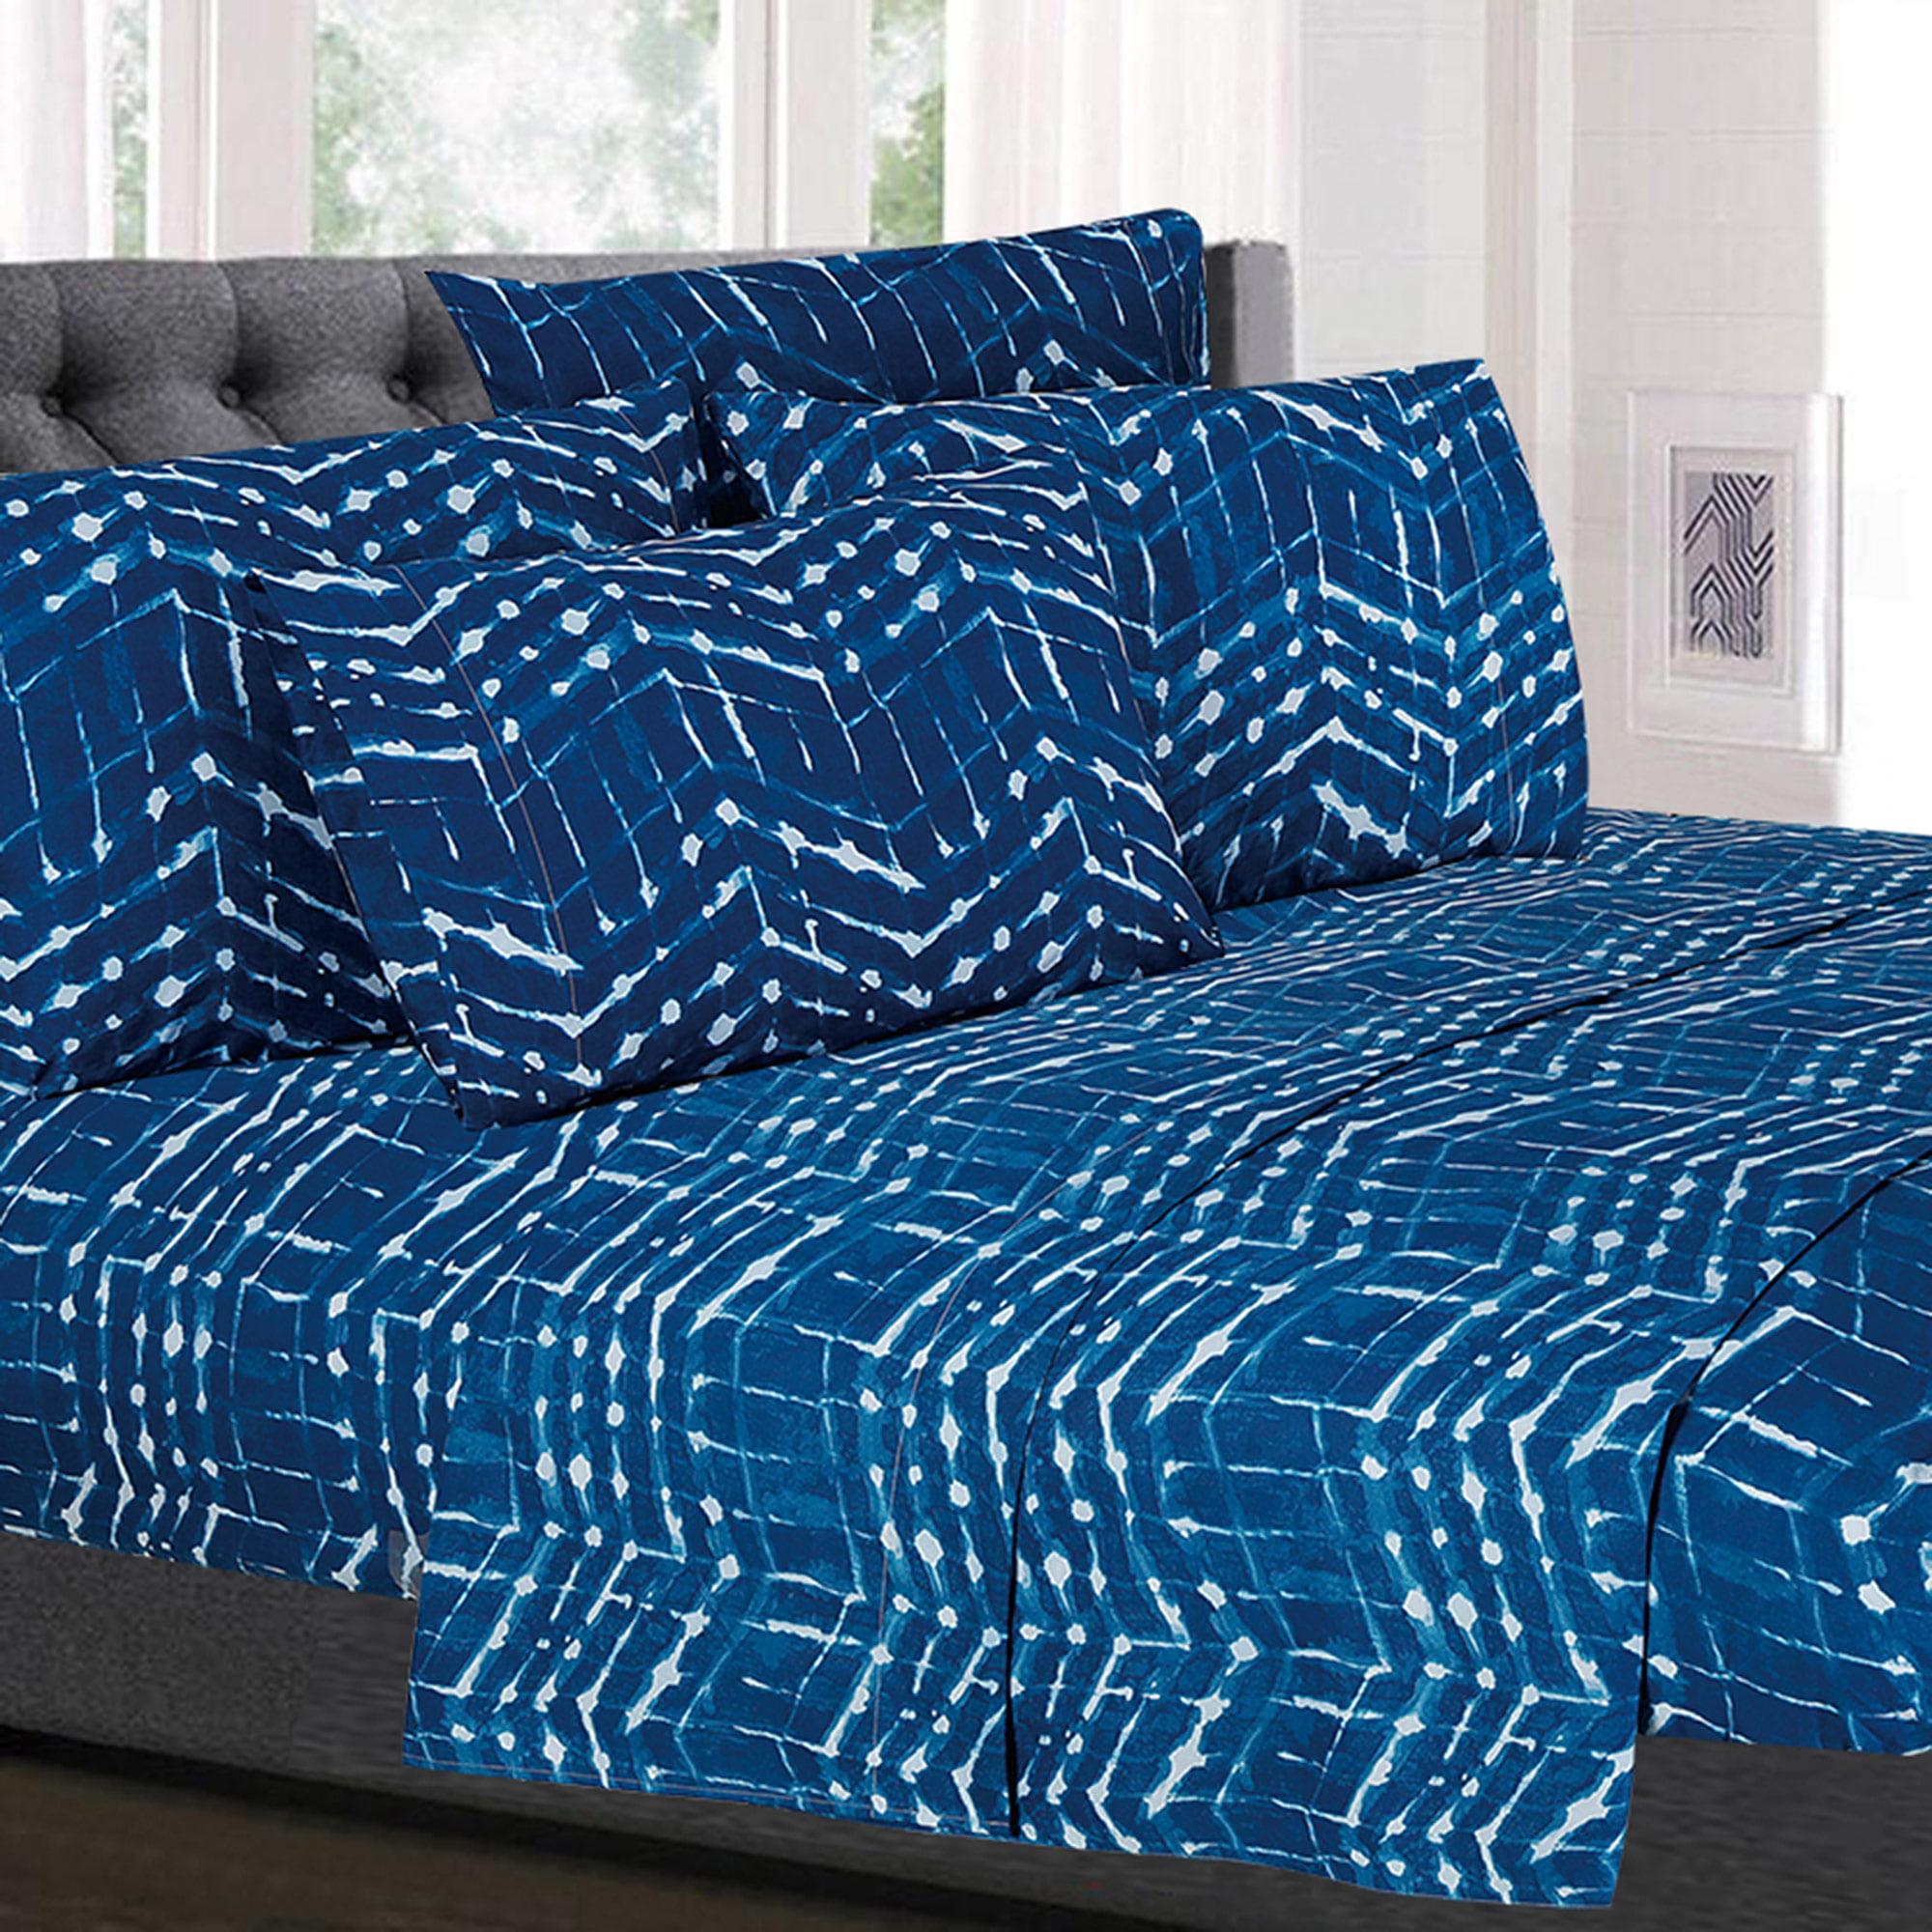 Monroe Blue Zig Zag Pattern Geometric 6-Piece 1500 Thread Count Sheet Set